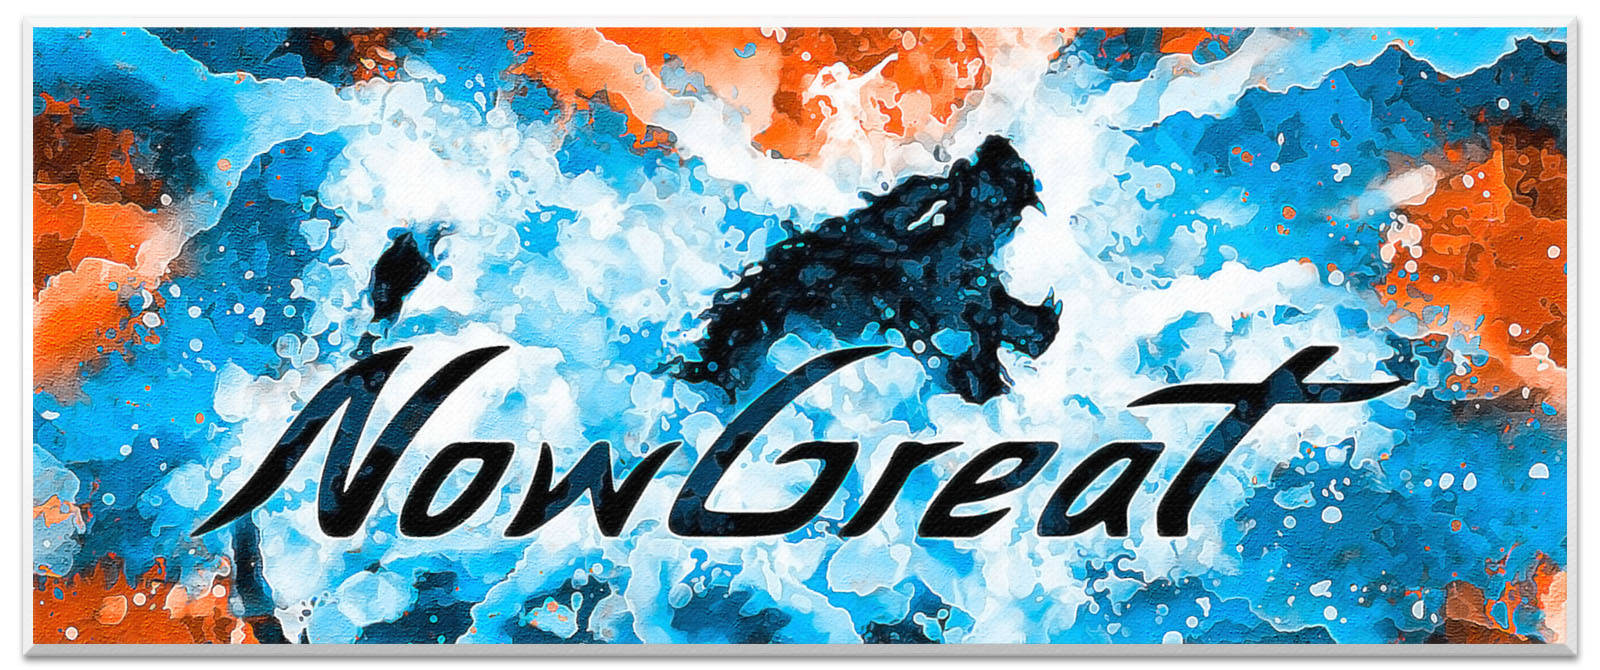 ng-now-great-slider-artwork-art-design-quote-lion-roar1